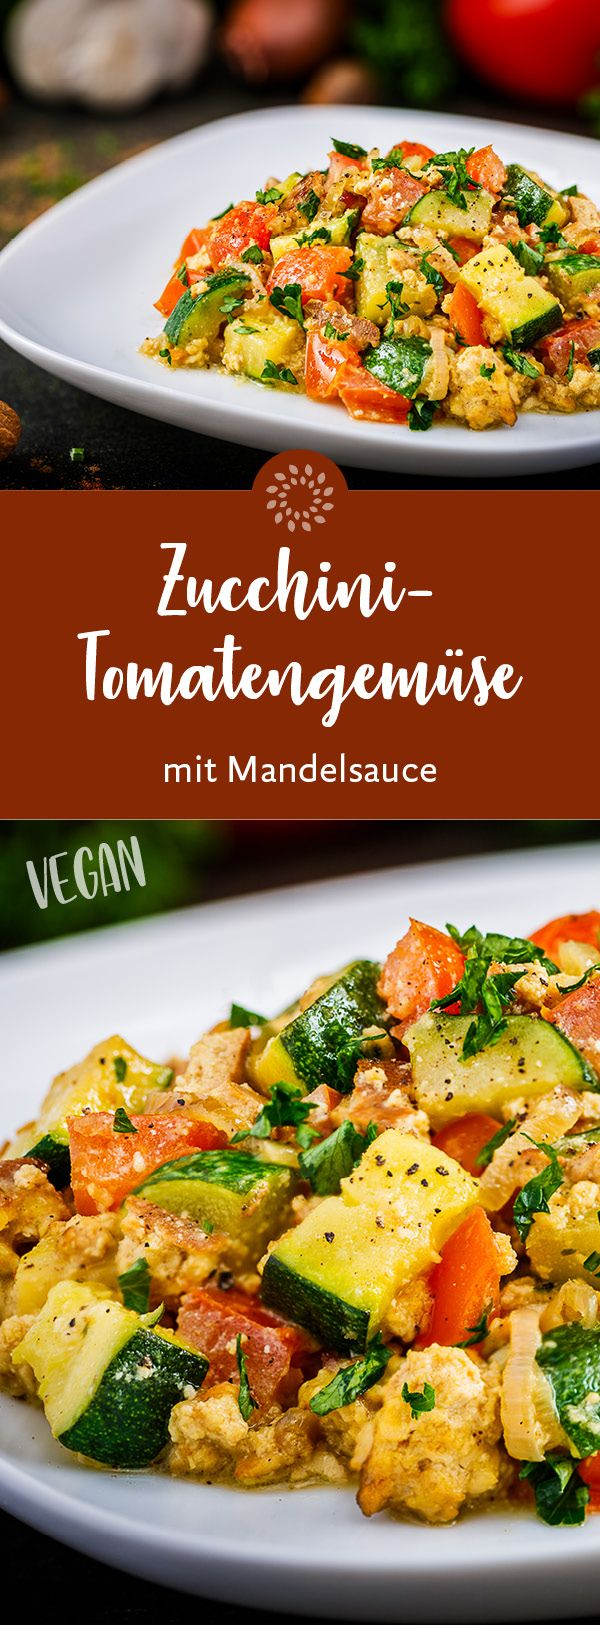 Zucchini-Tomatengemüse mit Mandelsauce